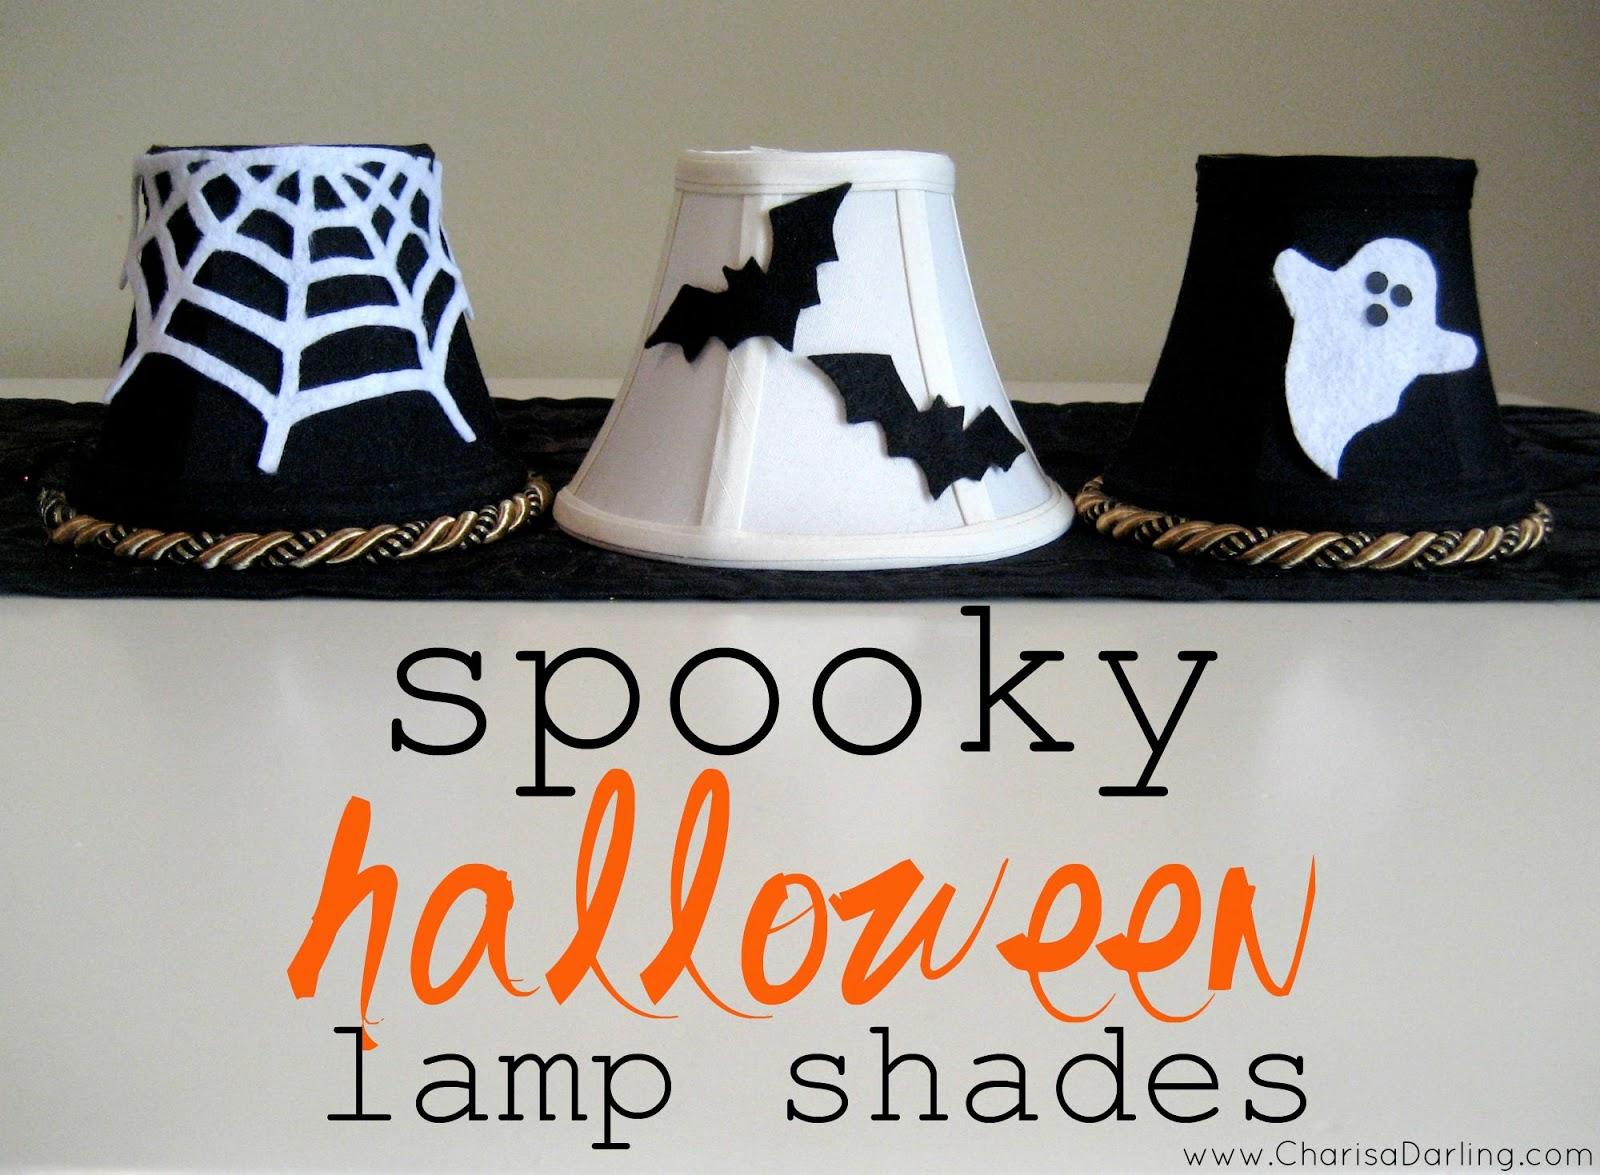 Spooky Halloween Lamp Shades | Charisa Darling